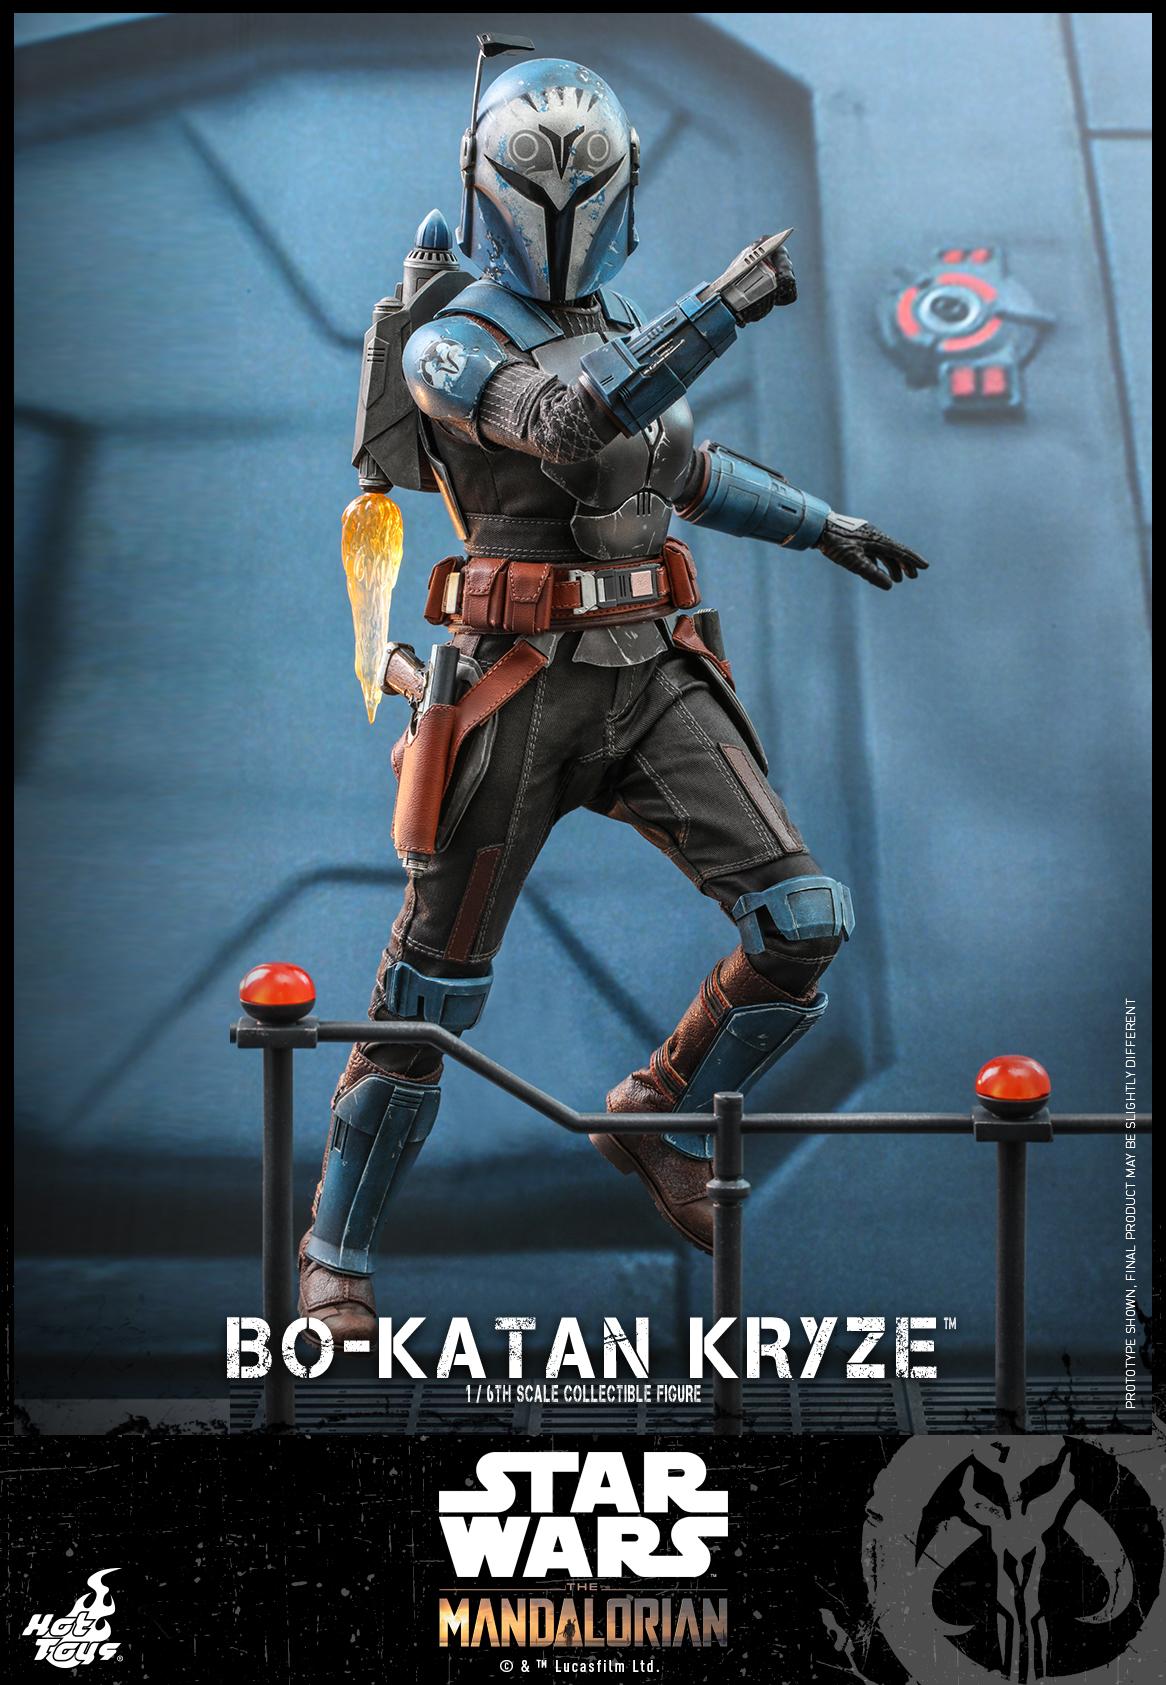 Hot Toys - The Mandalorian (S2) - Bo-Katan Kryze Collectible Figure_PR2